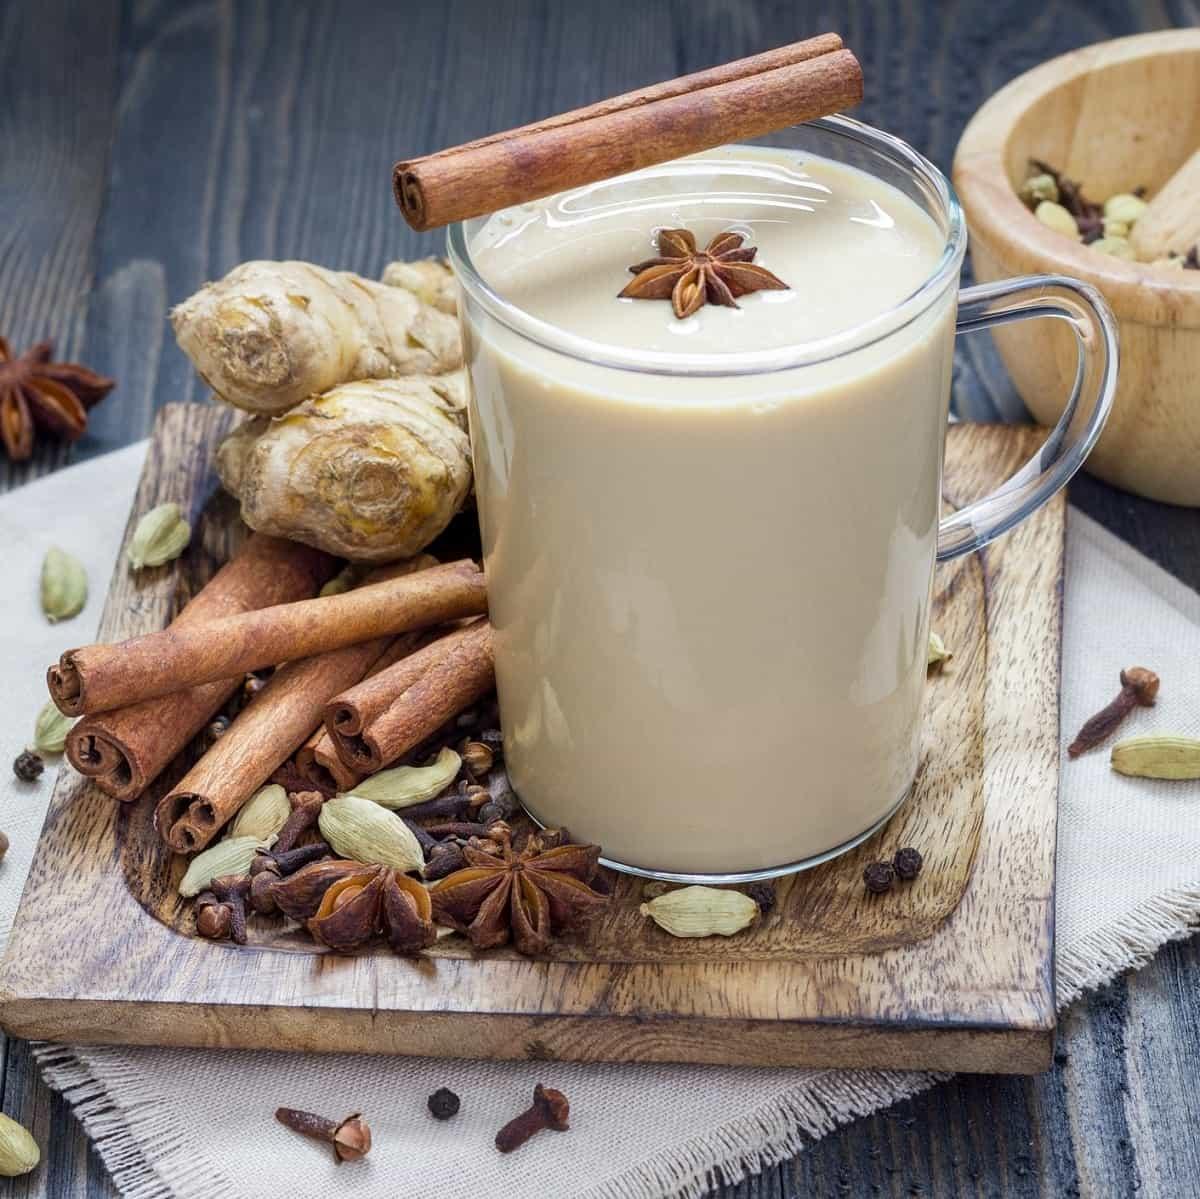 Рецепты чая масала: самые вкусные и ароматные варианты